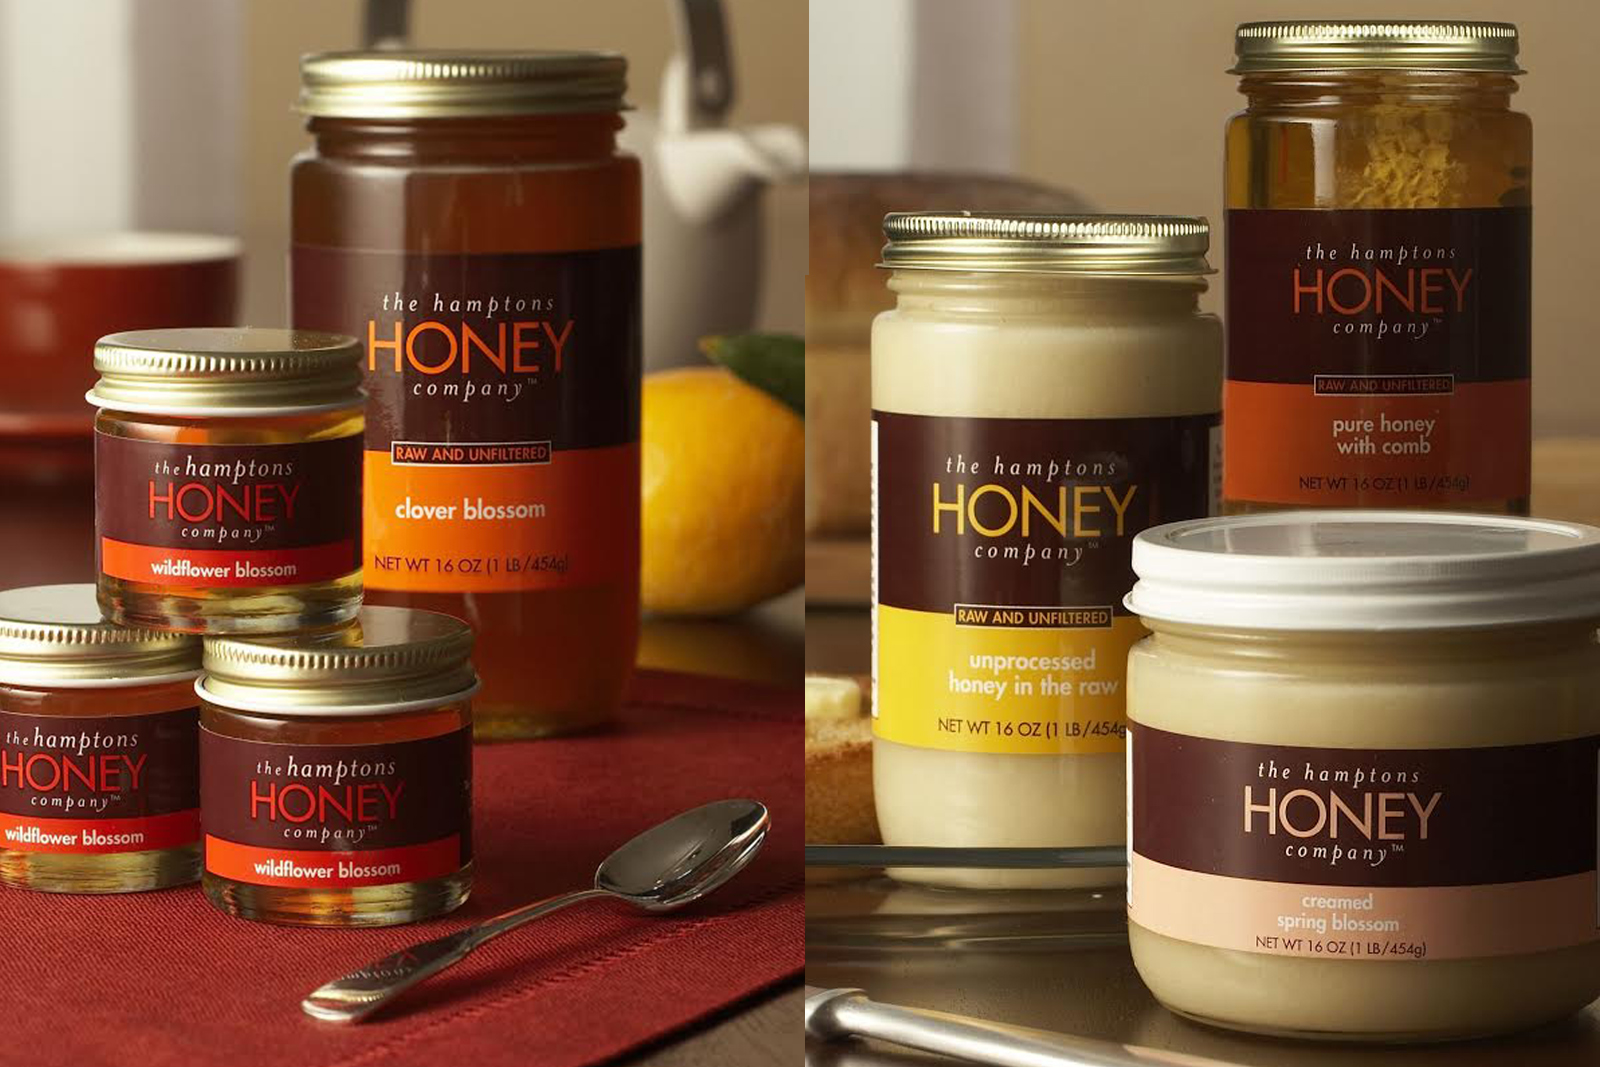 LOCAL FLAVOR: The Hamptons Honey Company